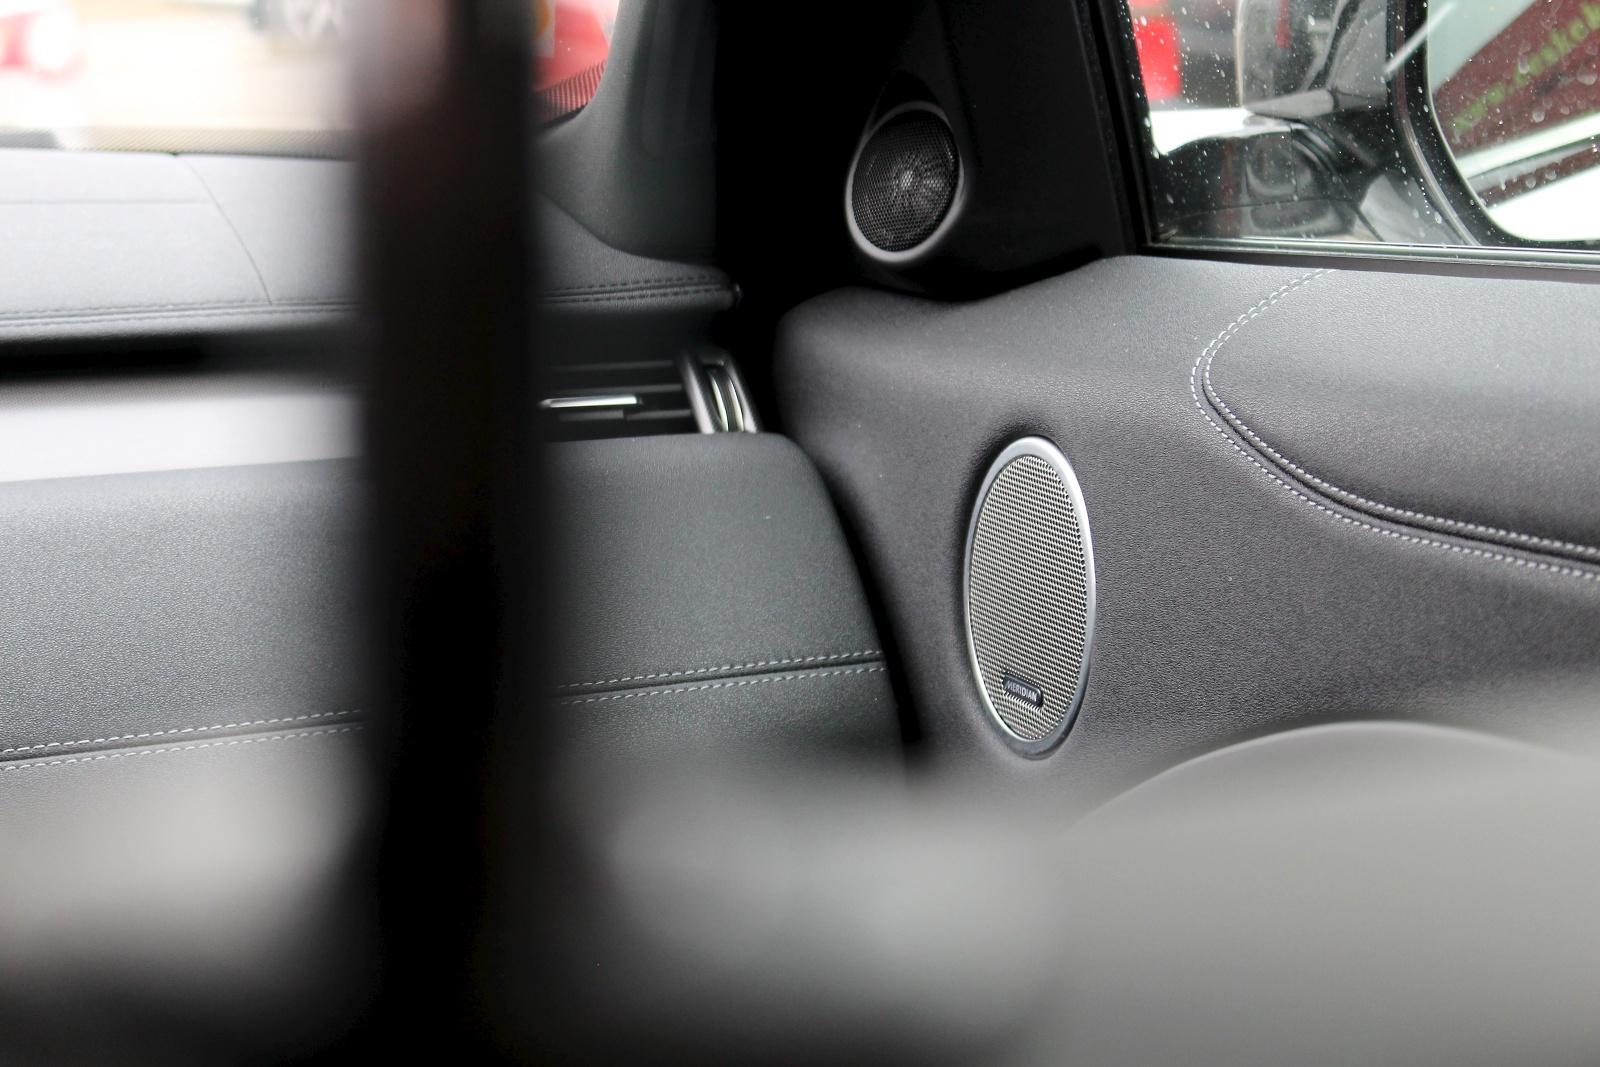 test range rover evoque si4 32 auto. Black Bedroom Furniture Sets. Home Design Ideas